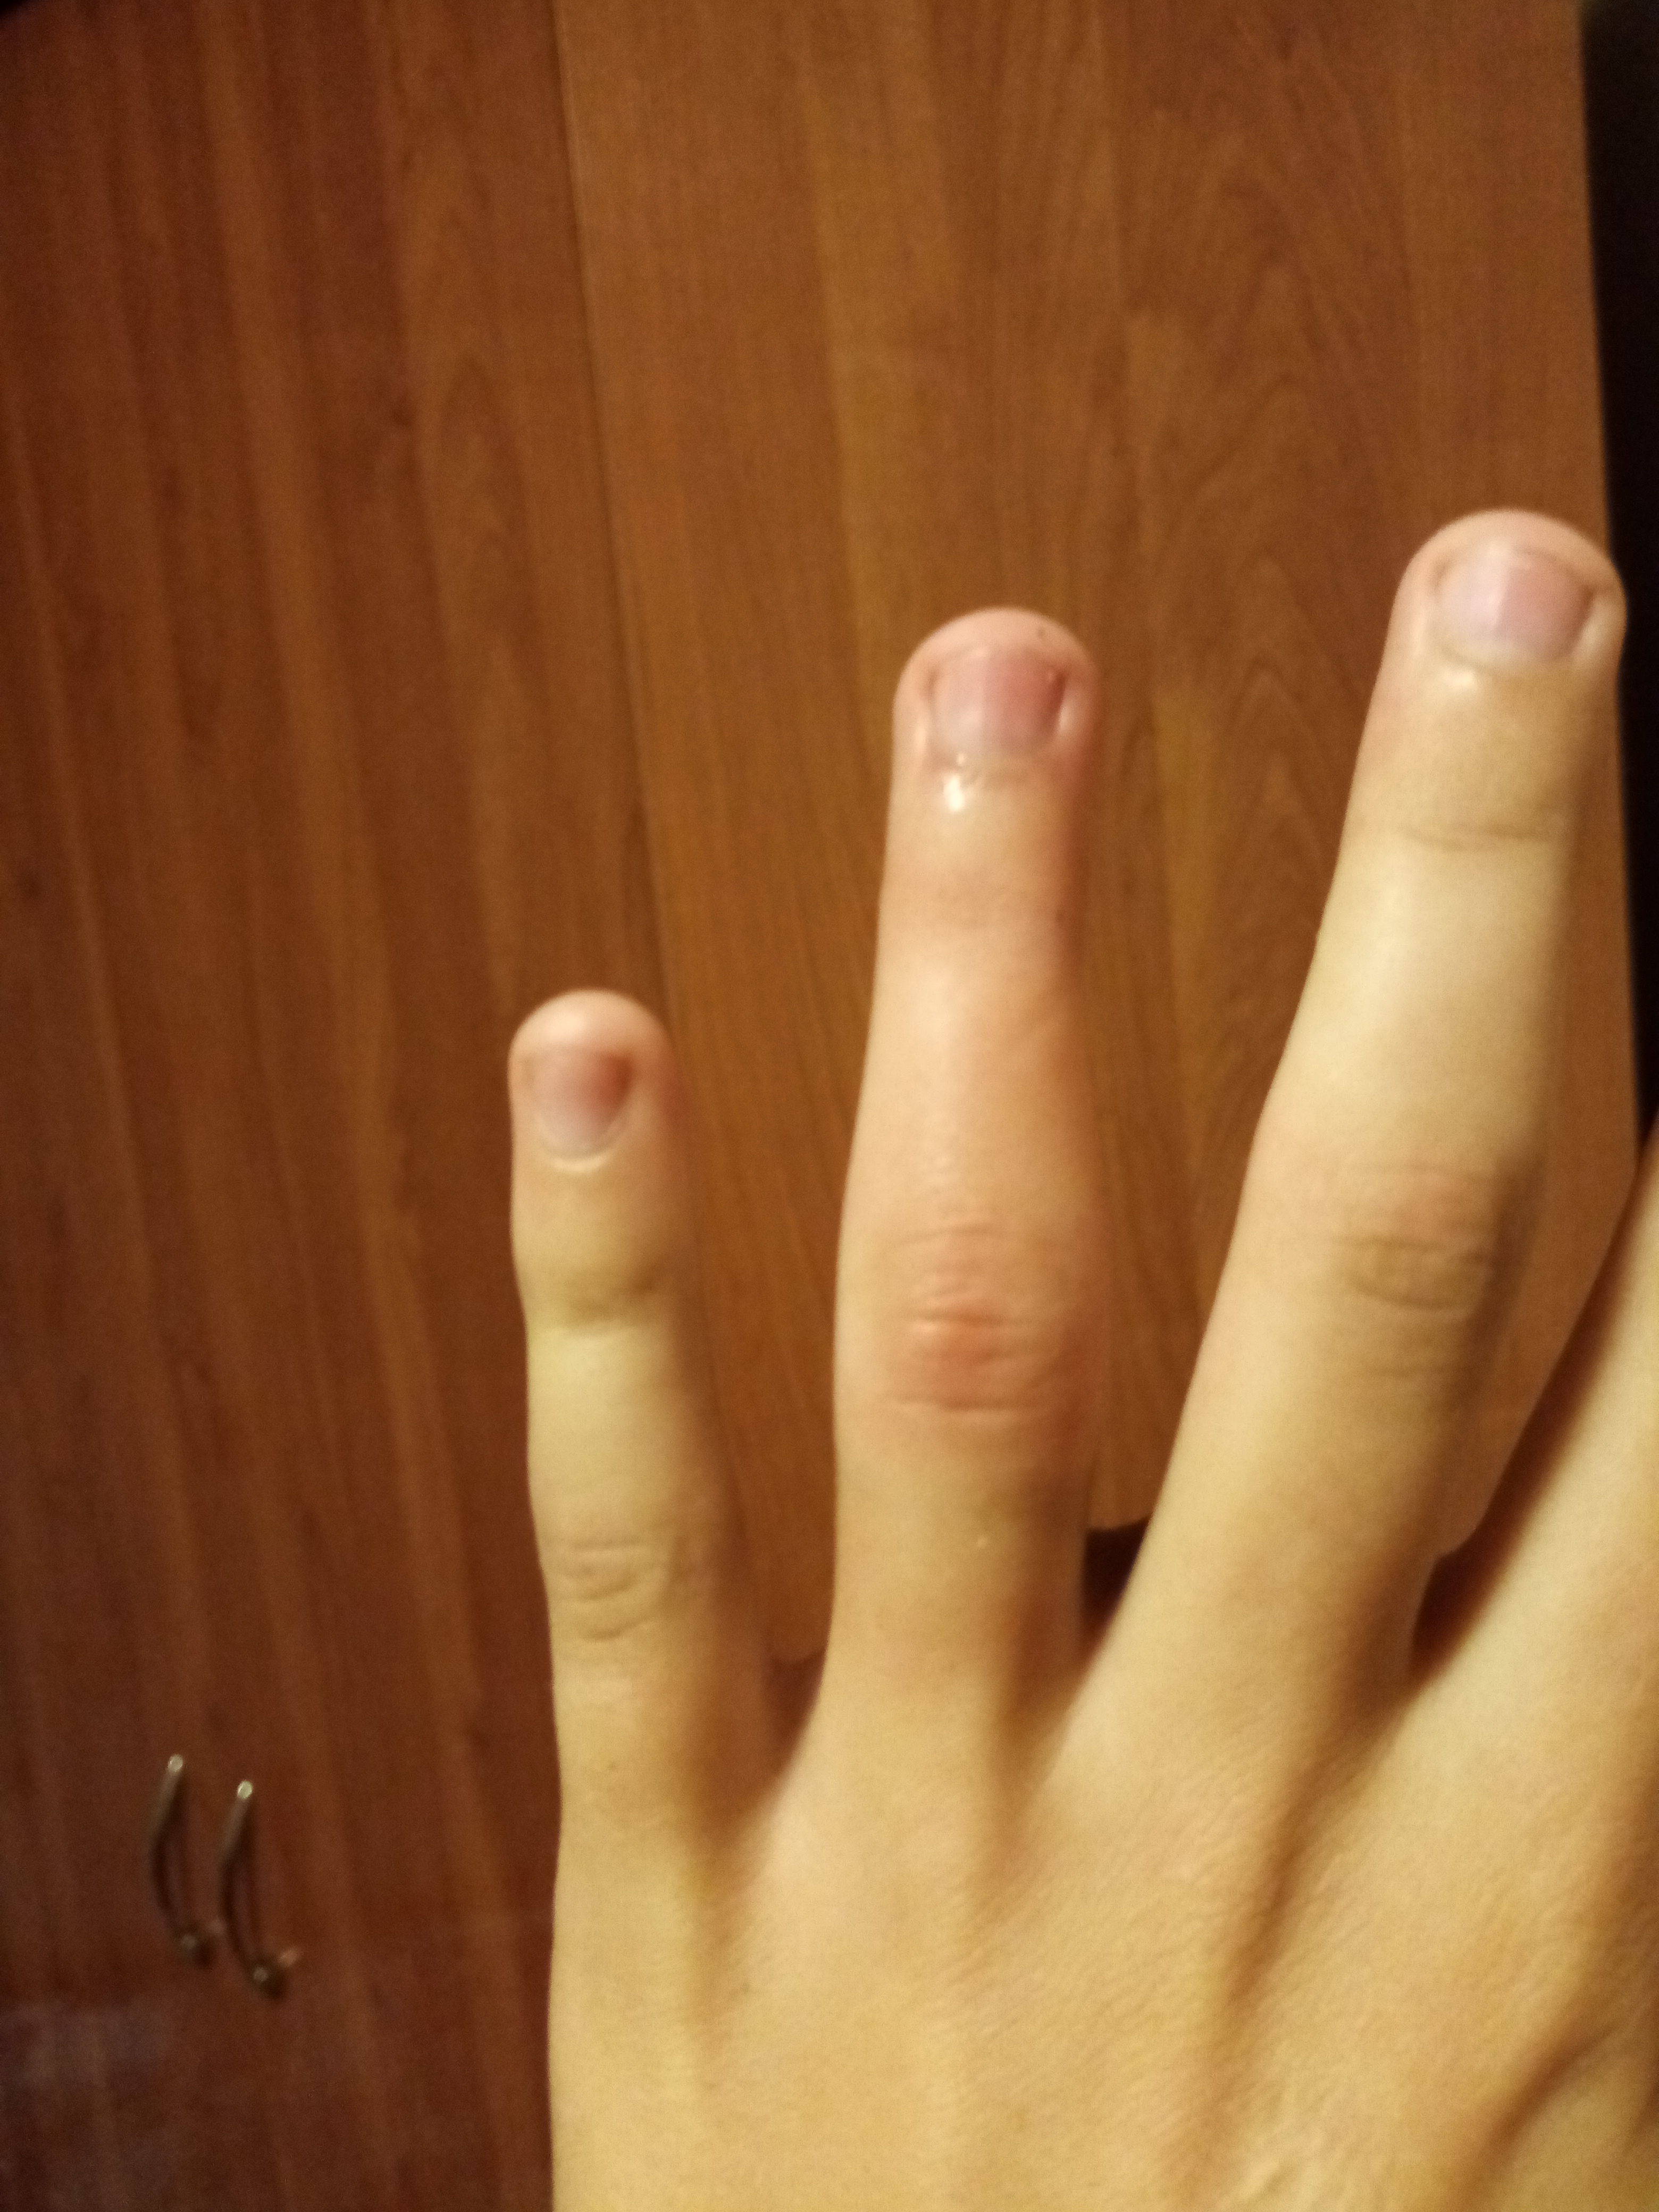 картинка опухший палец главном плане